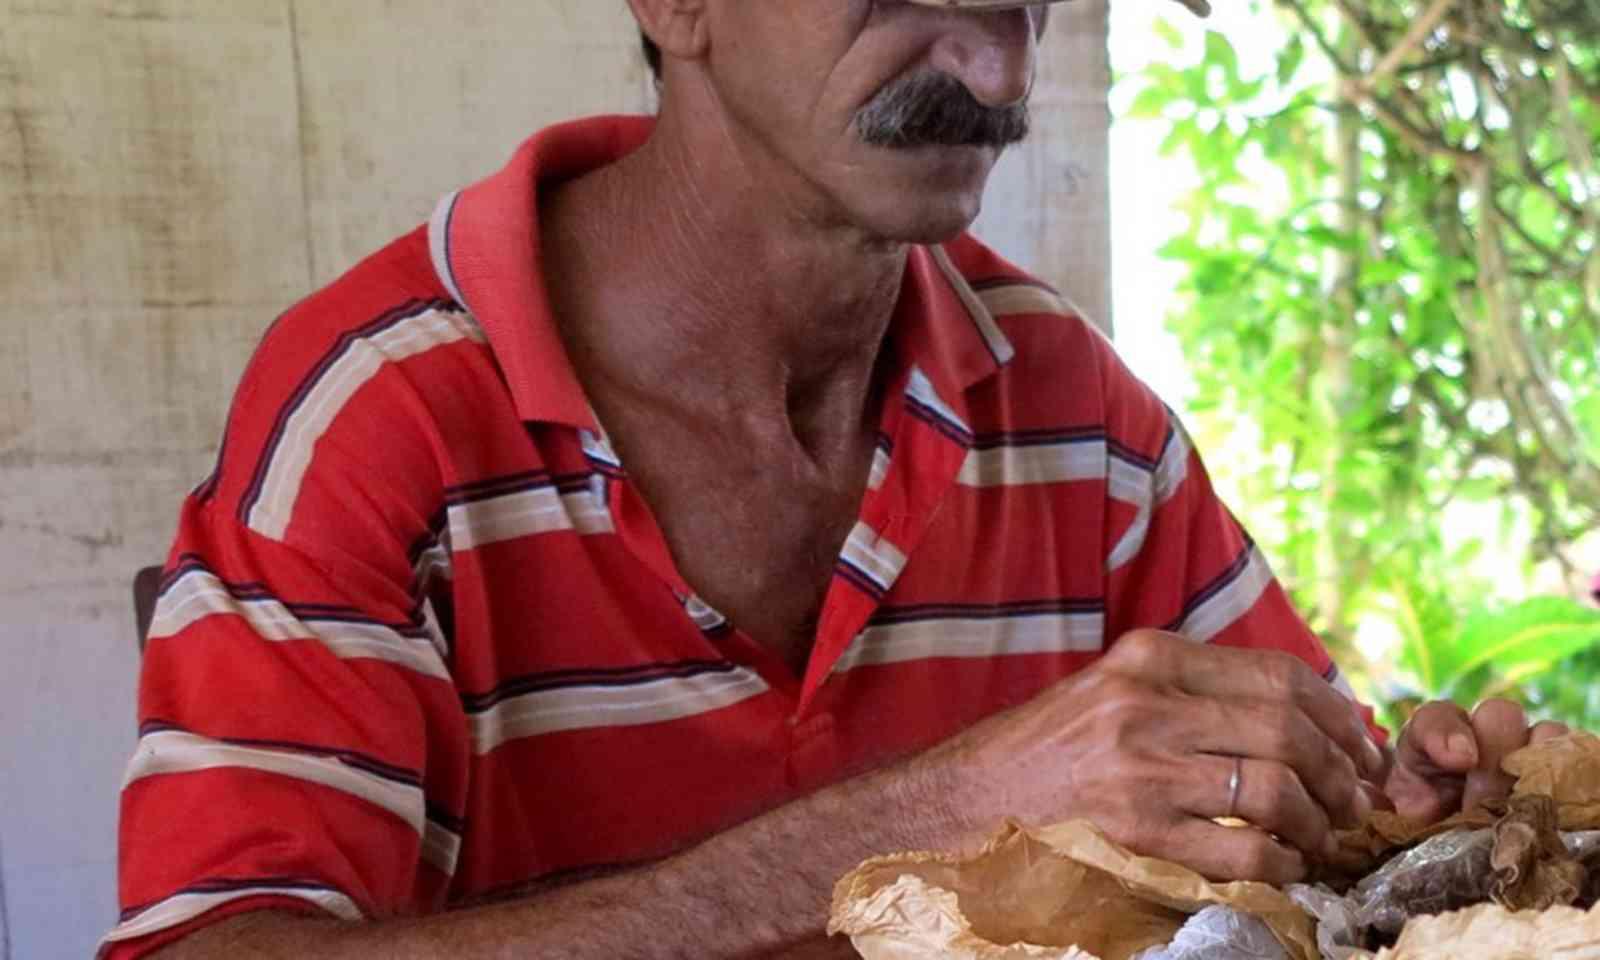 Farmer rolling cigars (Dave and Carmen Allan-Petale)